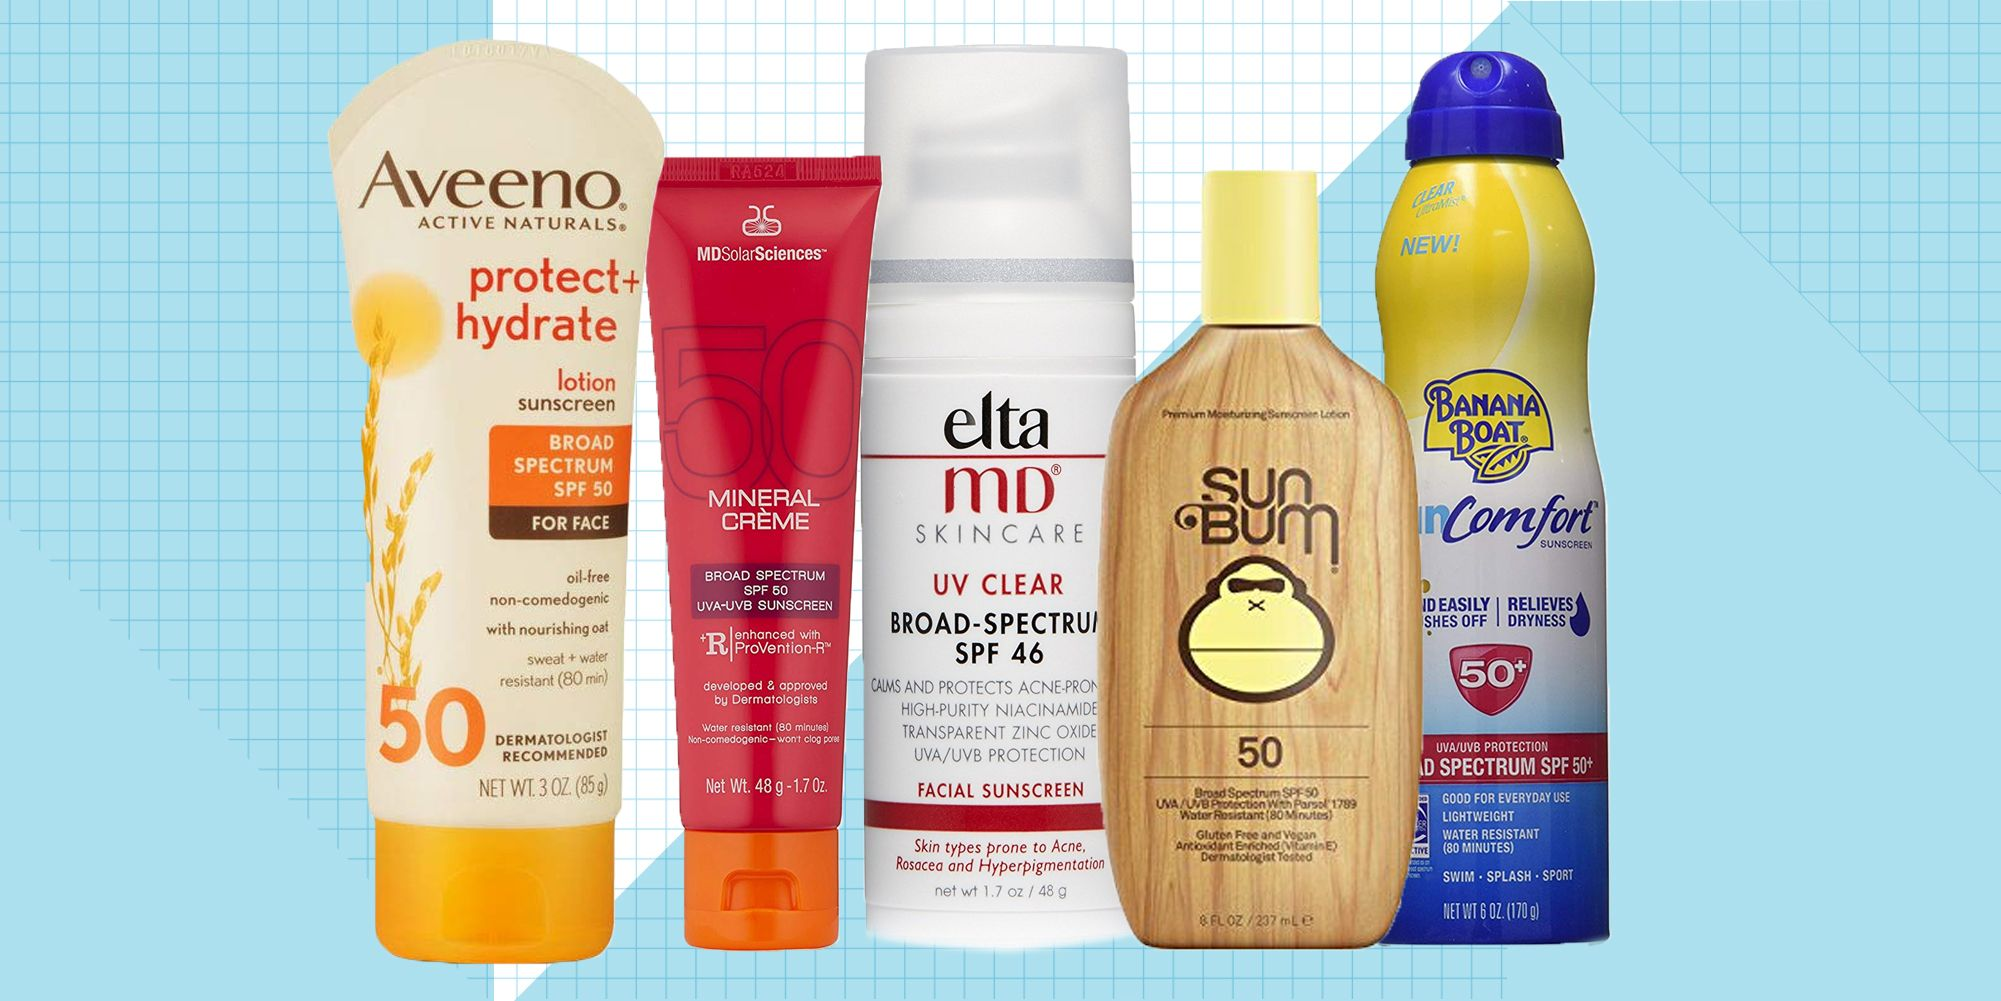 6 Best Sunscreens For Sensitive Skin 2019 Sensitive Skin